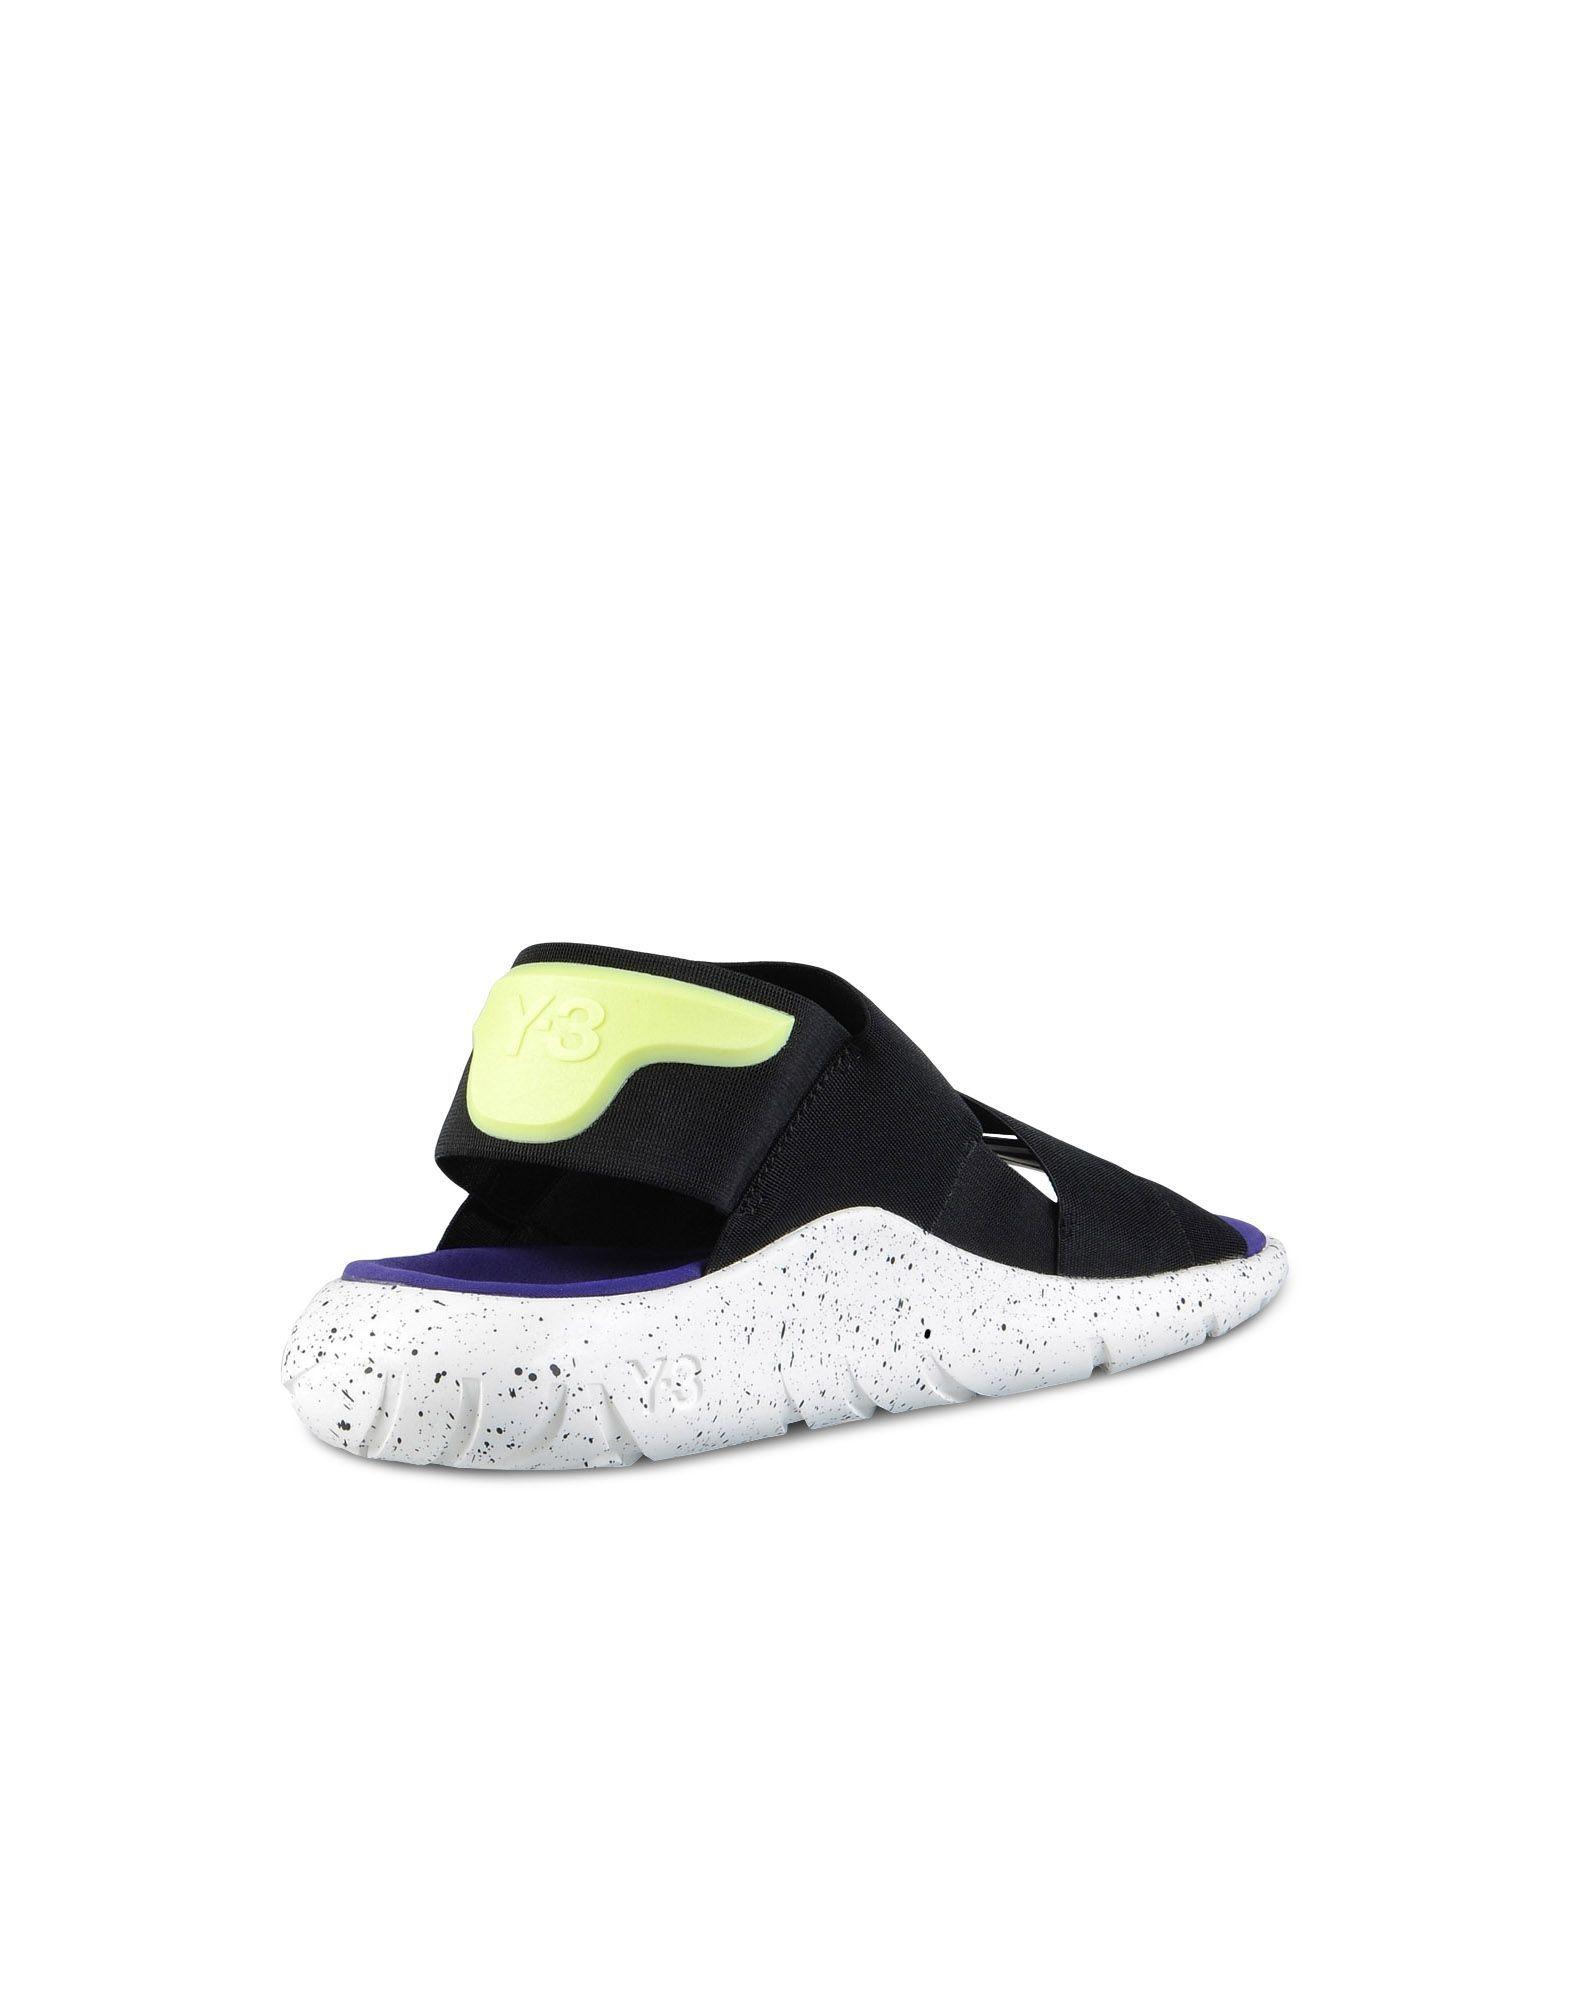 y 3 qasa sandalo scarpe uomo y 3 adidas 01 scarpe pinterest scarpe